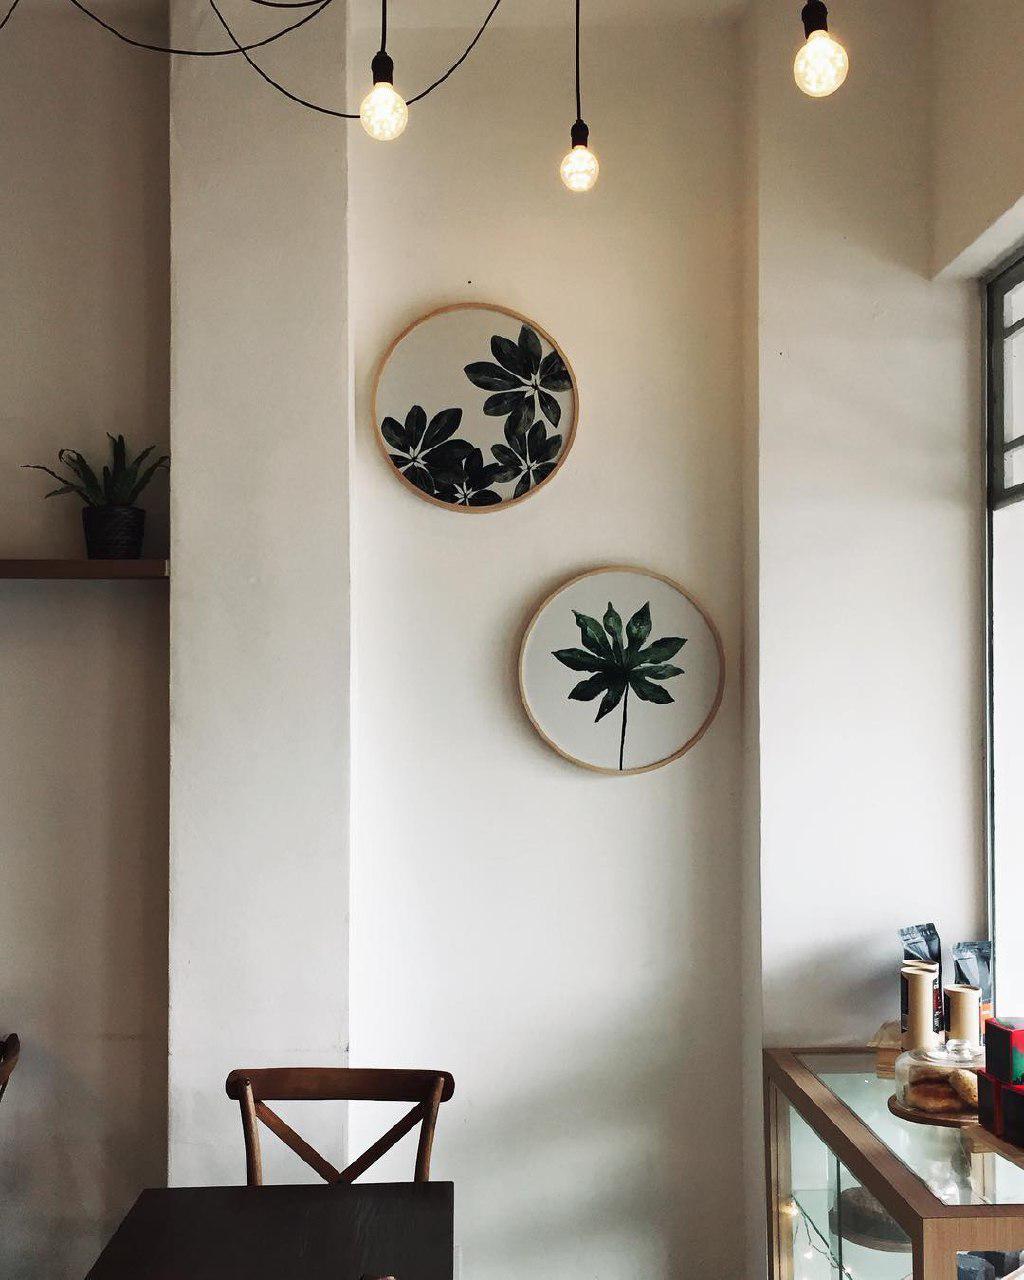 Romantic Cafes - The Affogato Bar